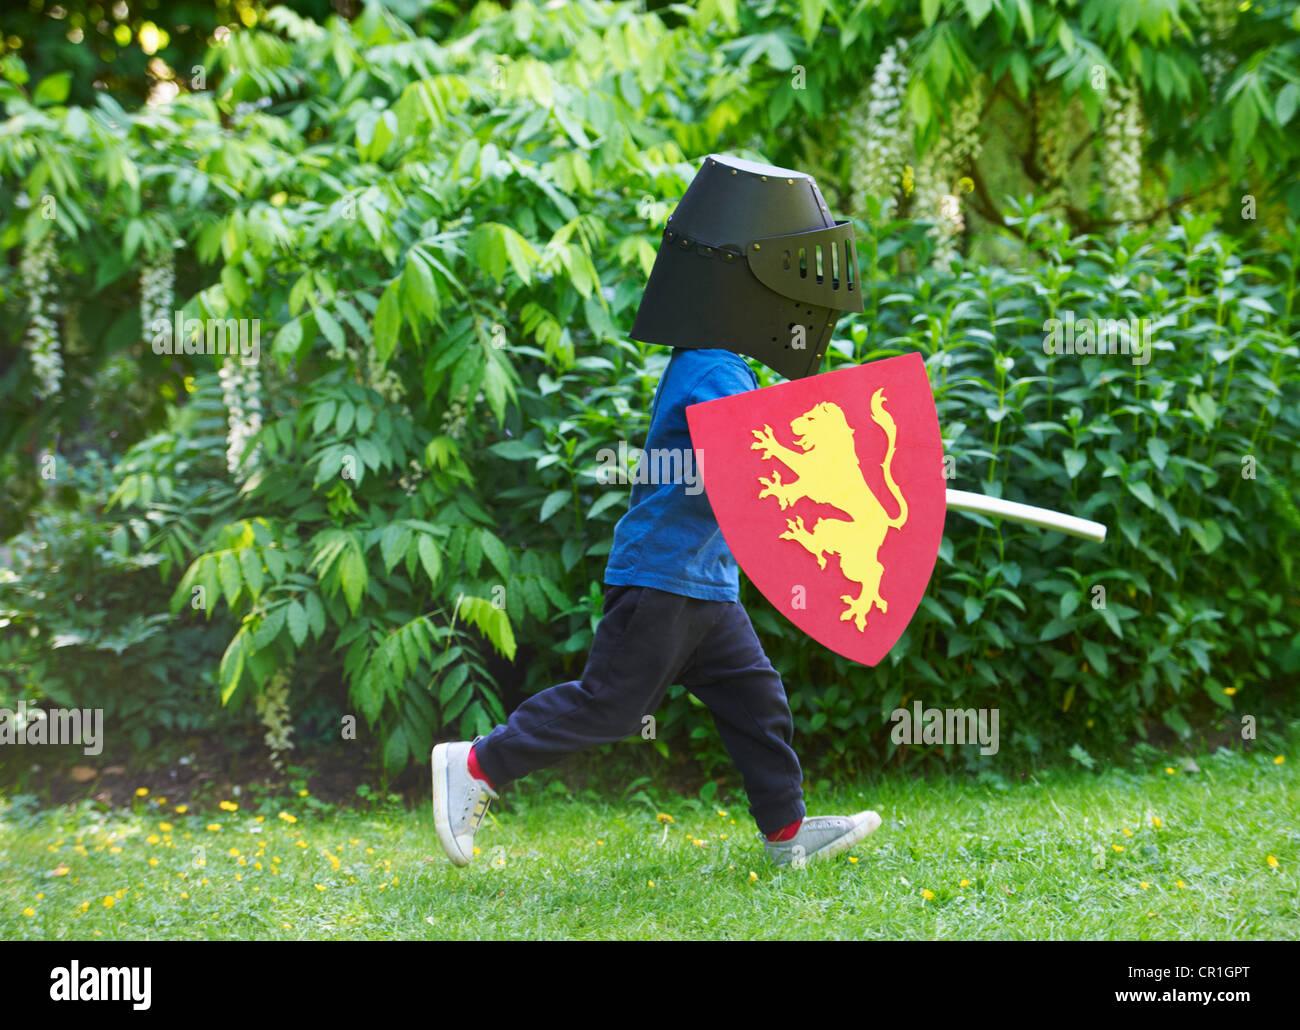 Garçon jouant avec sword in backyard Photo Stock